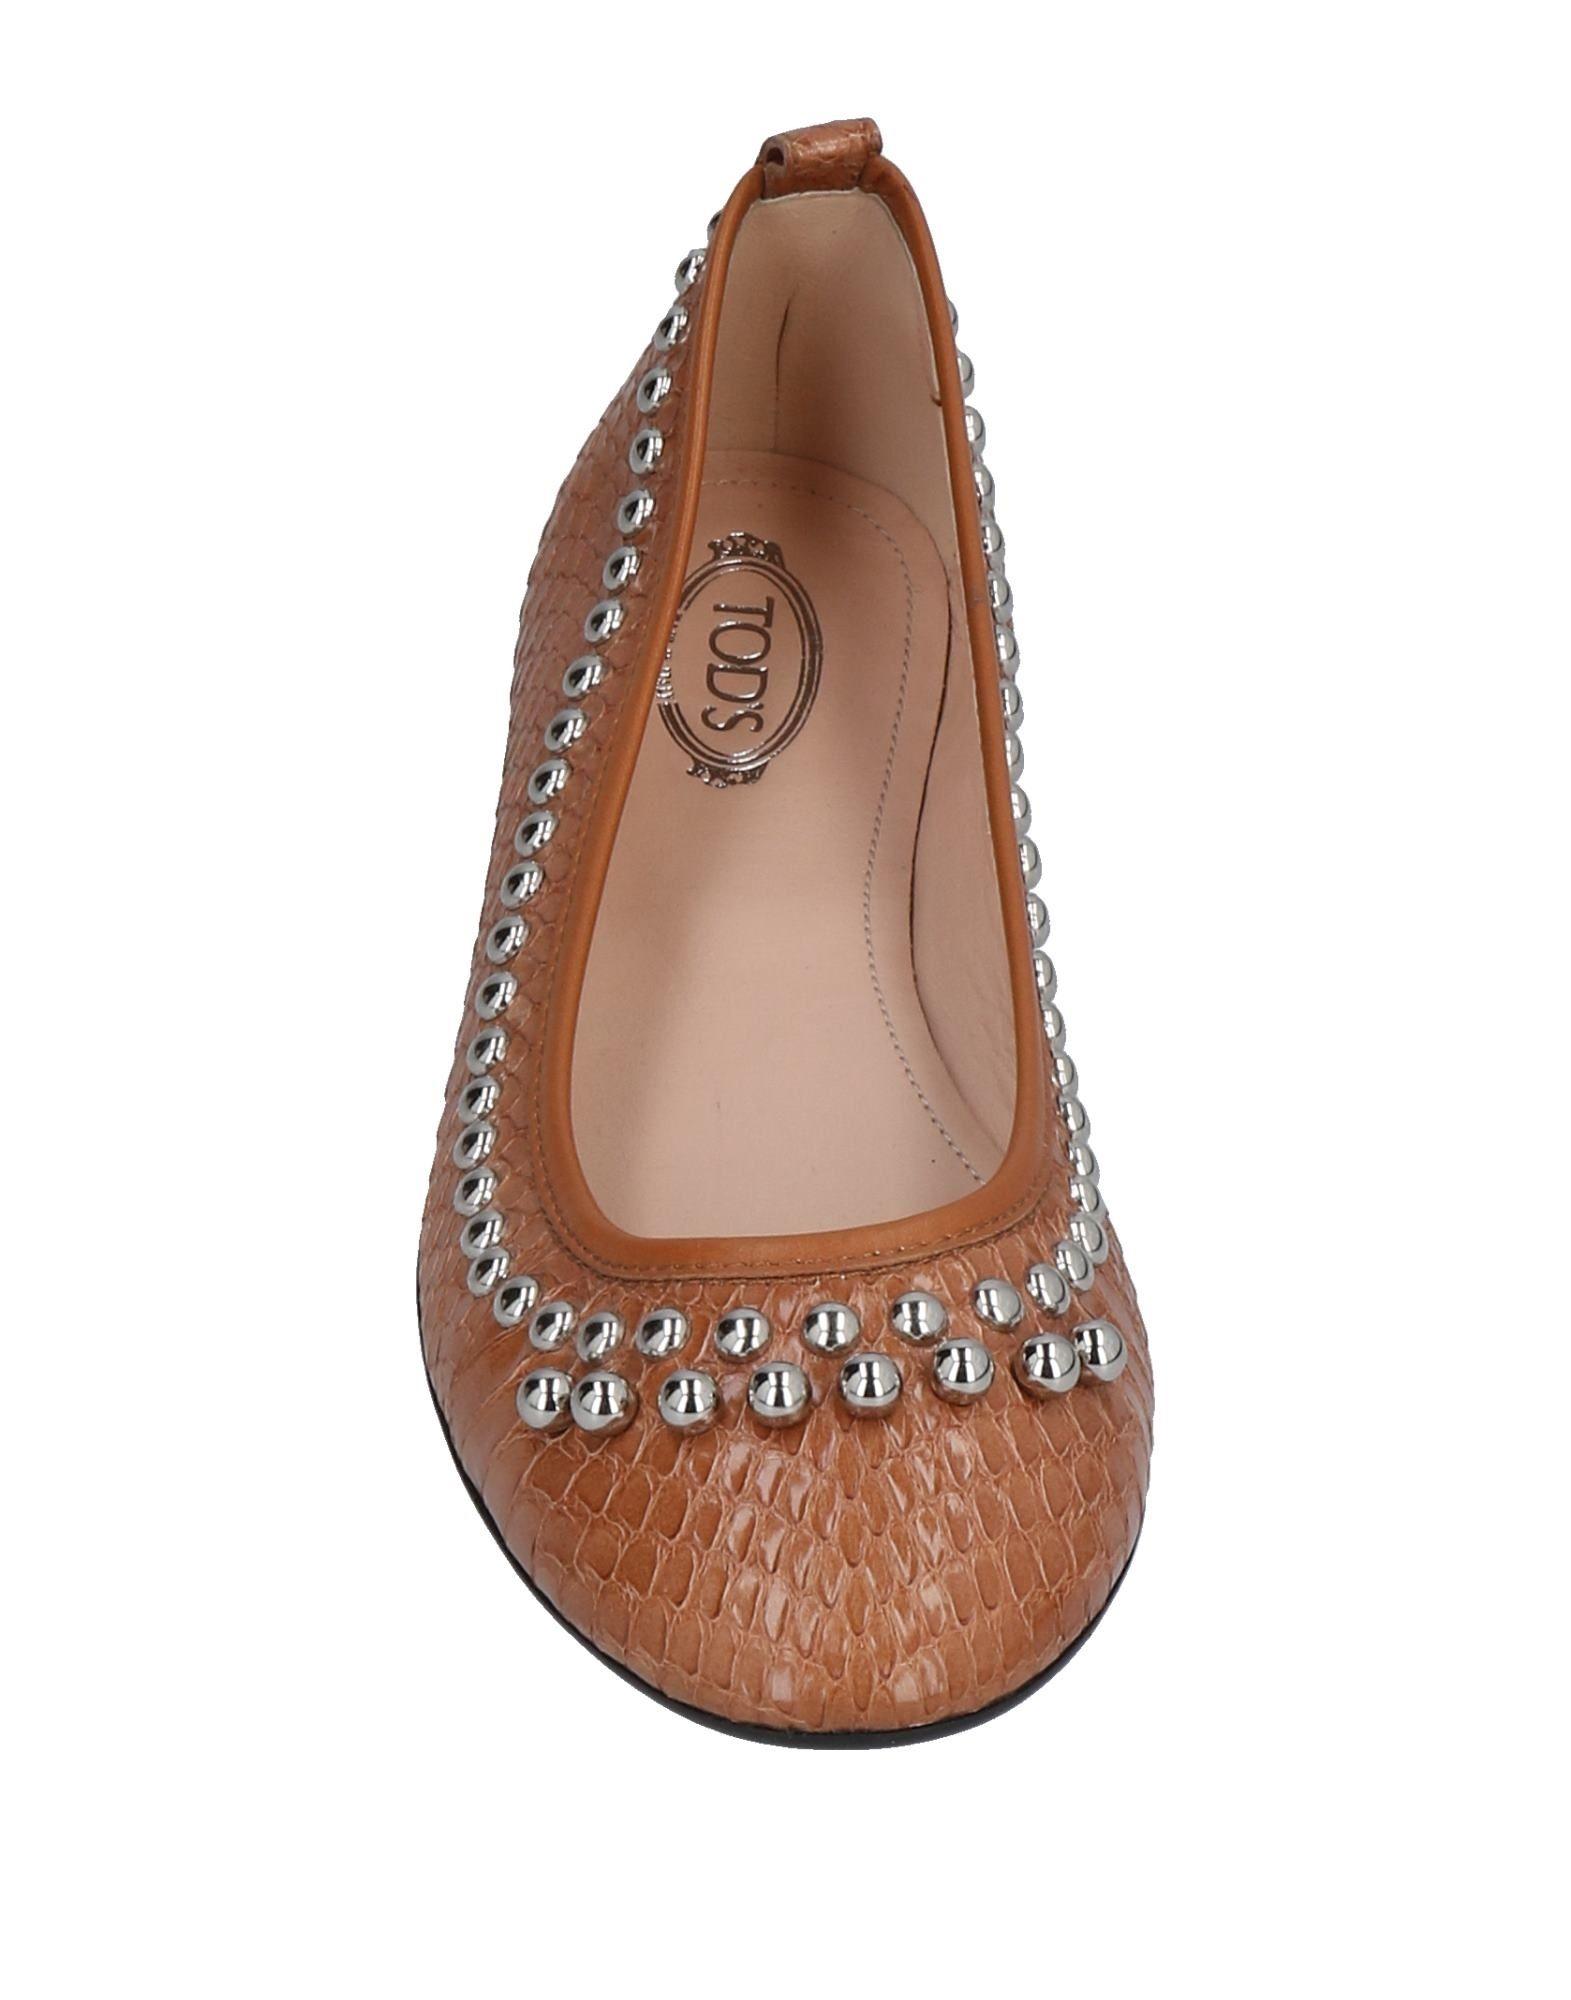 Rabatt Schuhe Ballerinas Tod's Ballerinas Schuhe Damen  11483251AK fdb6e2